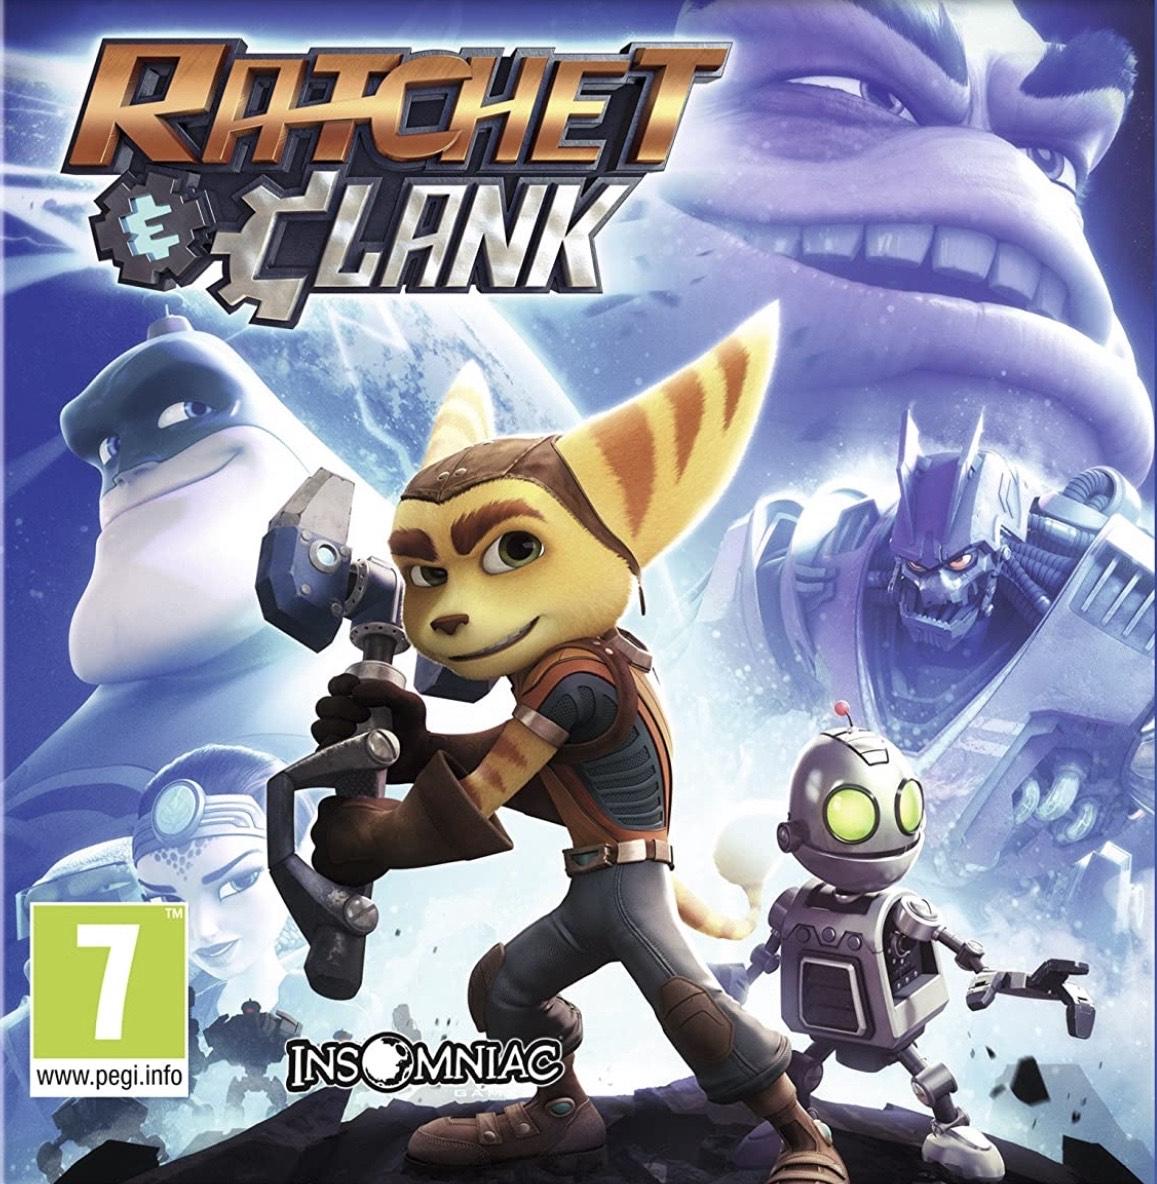 Ratchet and Clank (PS4 - Bundle Copy) - £9.99 @ eBay / evergameuk